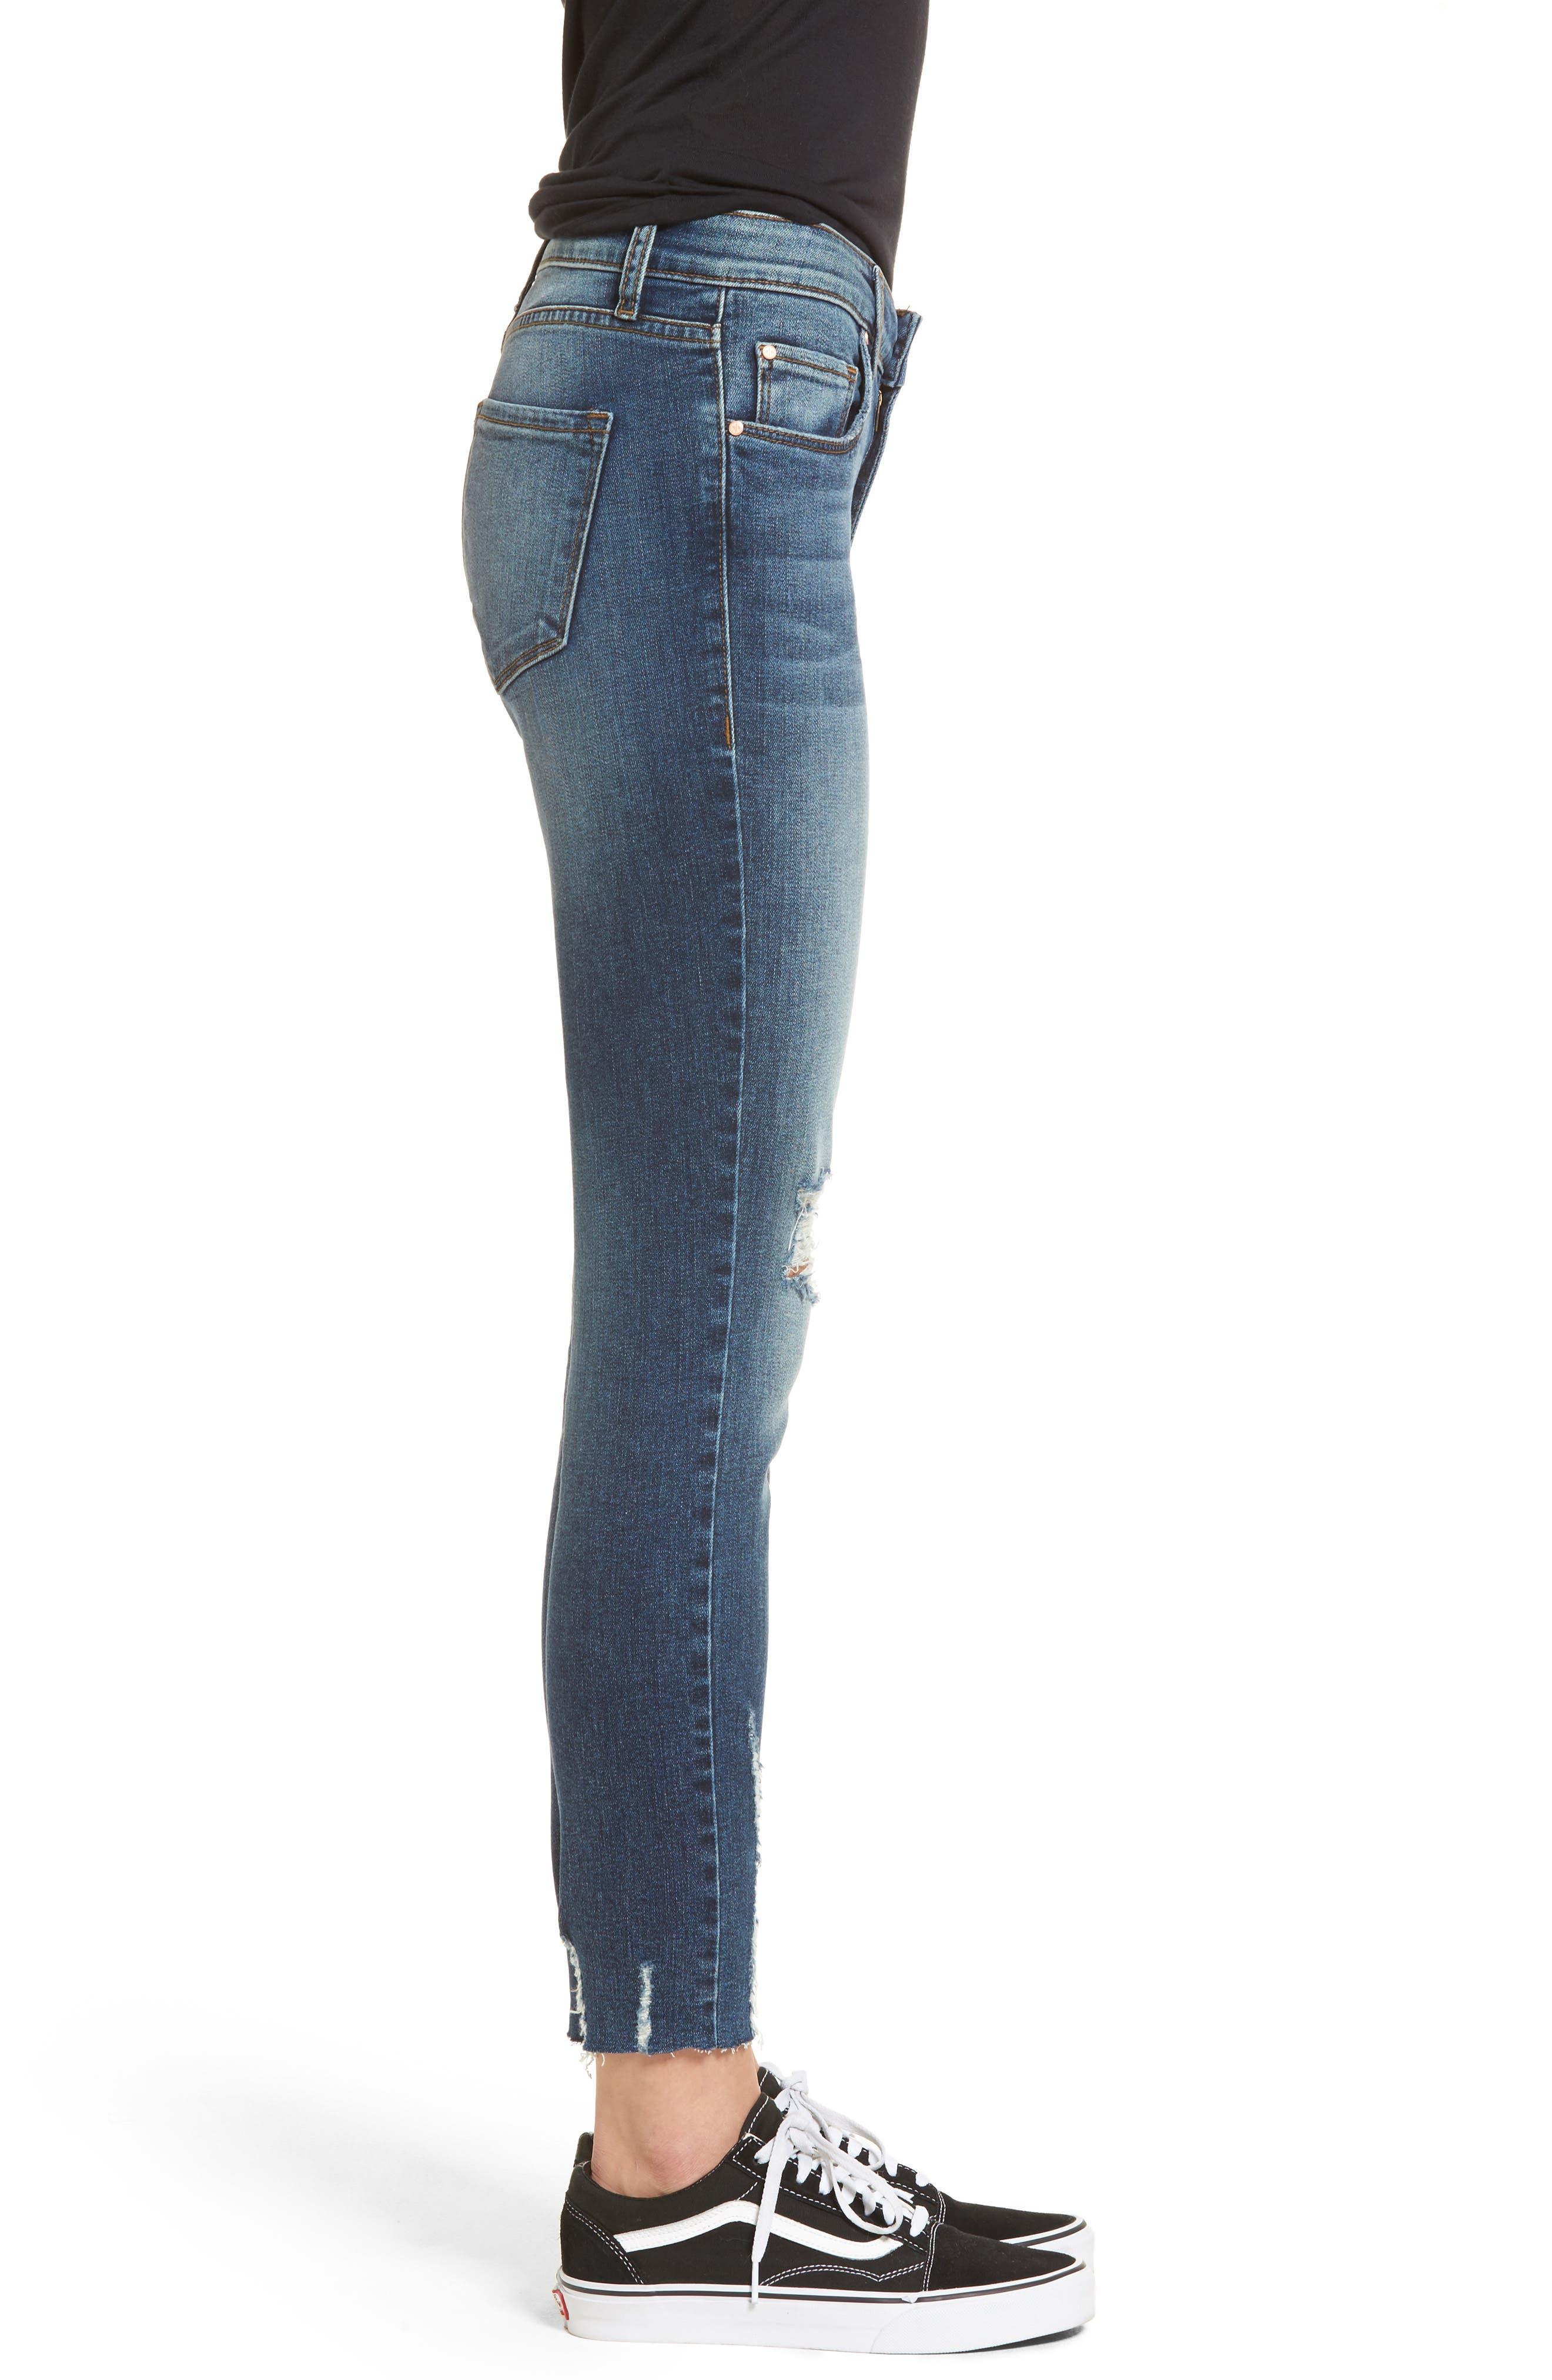 Decon Distressed Skinny Jeans,                             Alternate thumbnail 3, color,                             Vintage